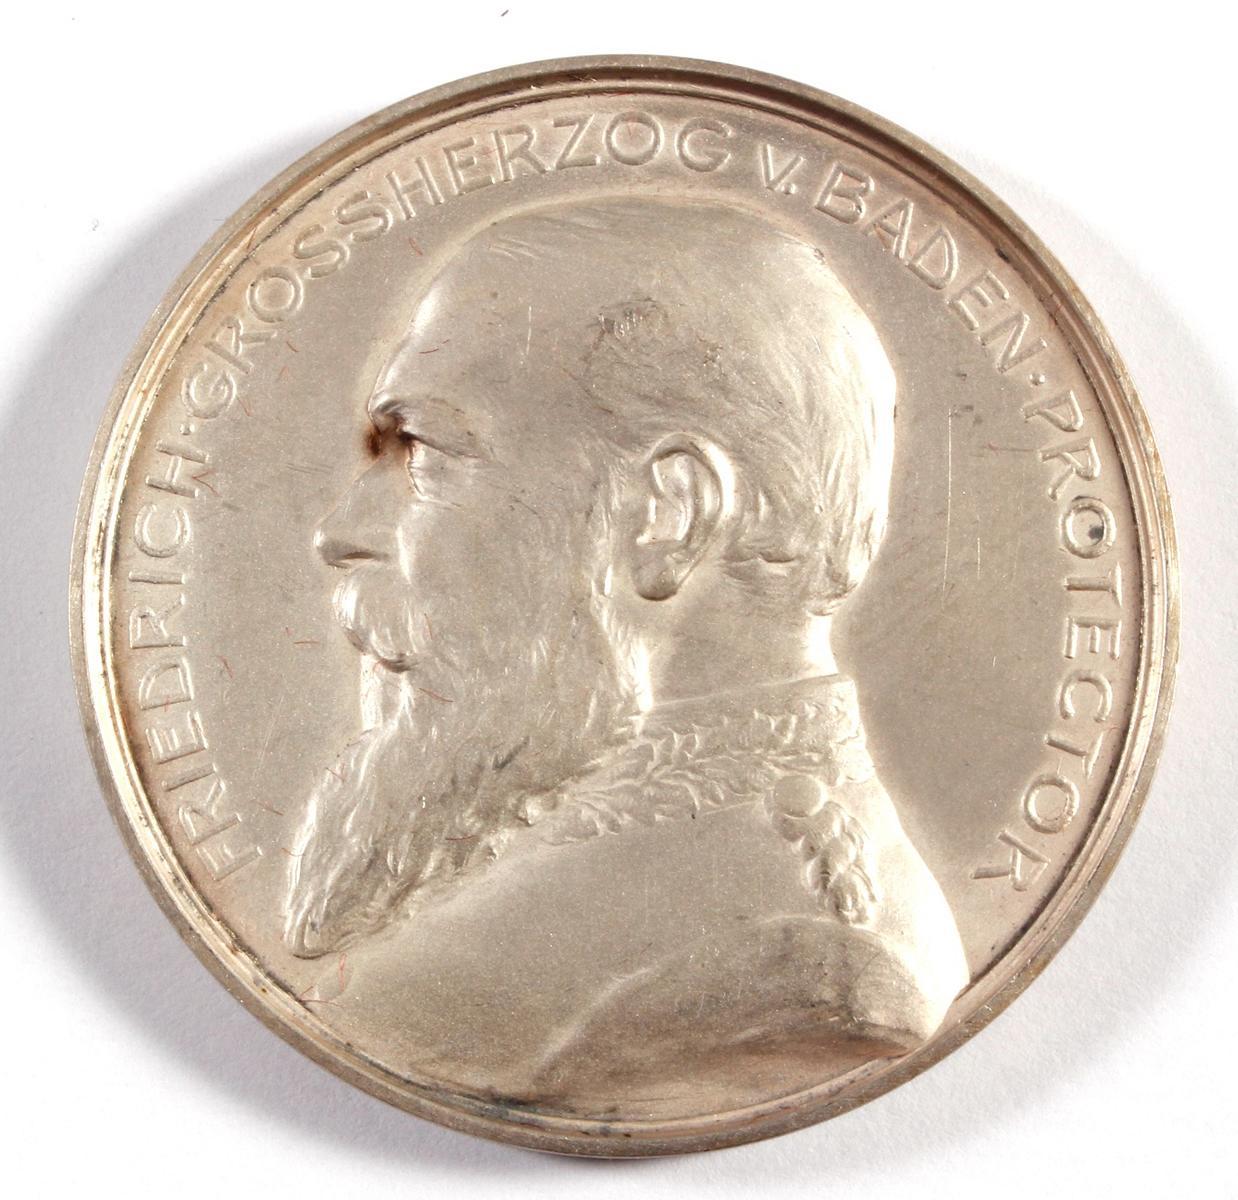 Medaille, XVIII. Verbandsschiessen Heidelberg 1901